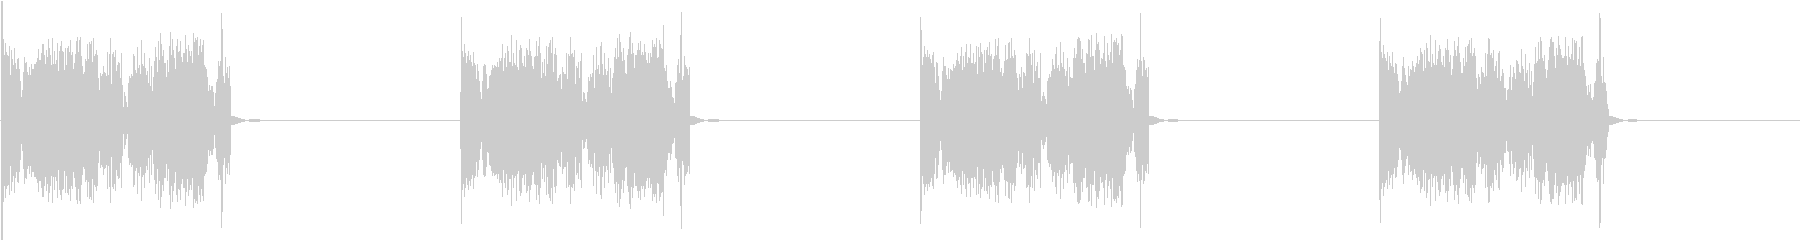 DJプレイ スクラッチ・ノイズ 36の未再生の波形